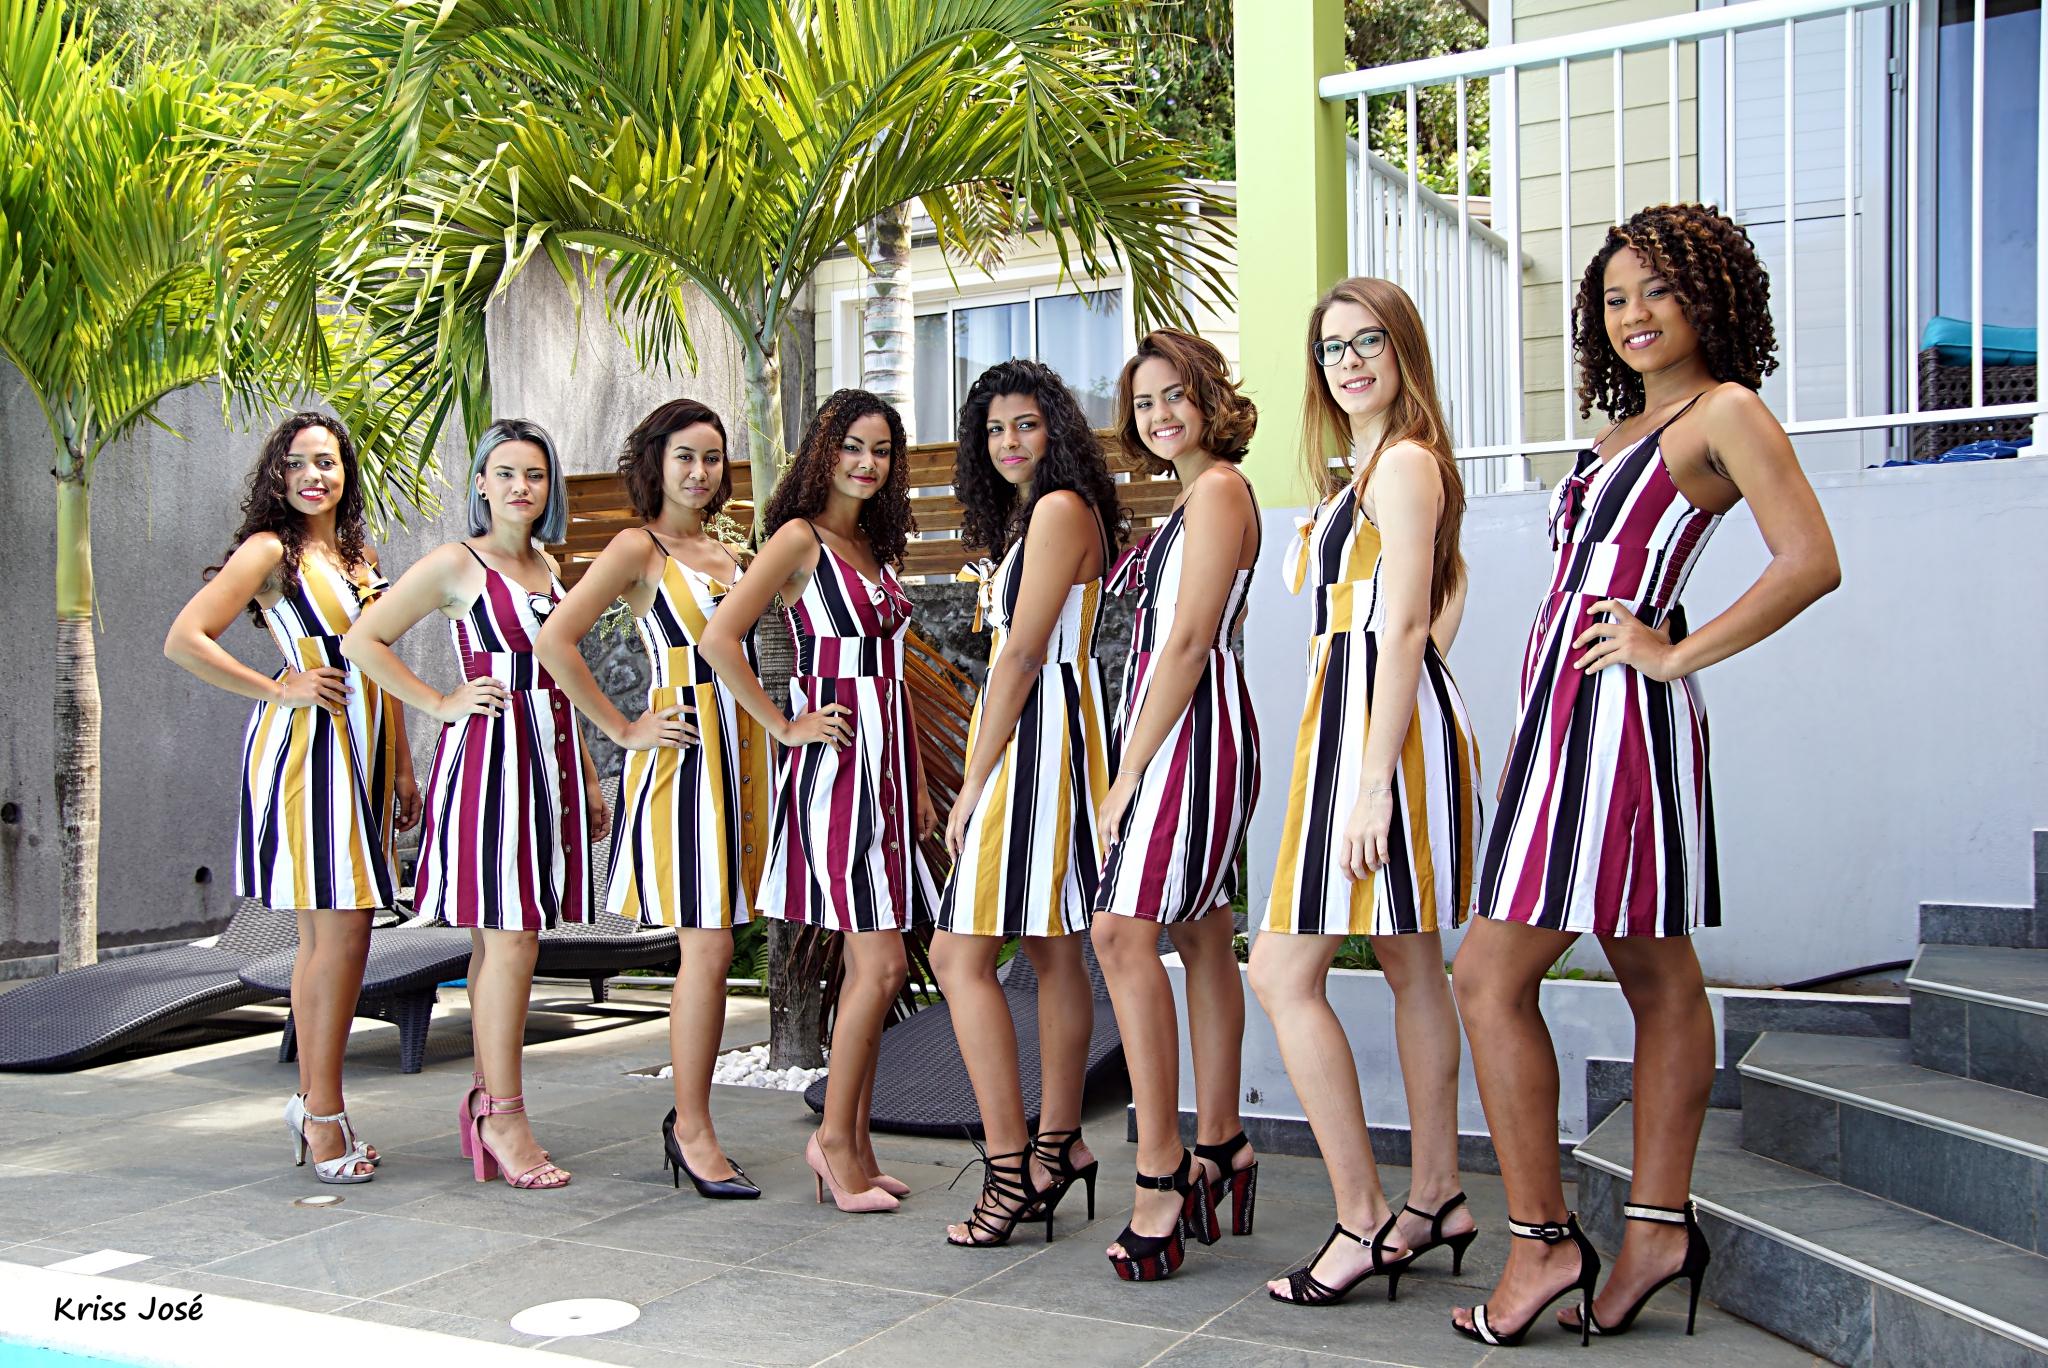 Les 8 candidates Miss Saint-Joseph 2018